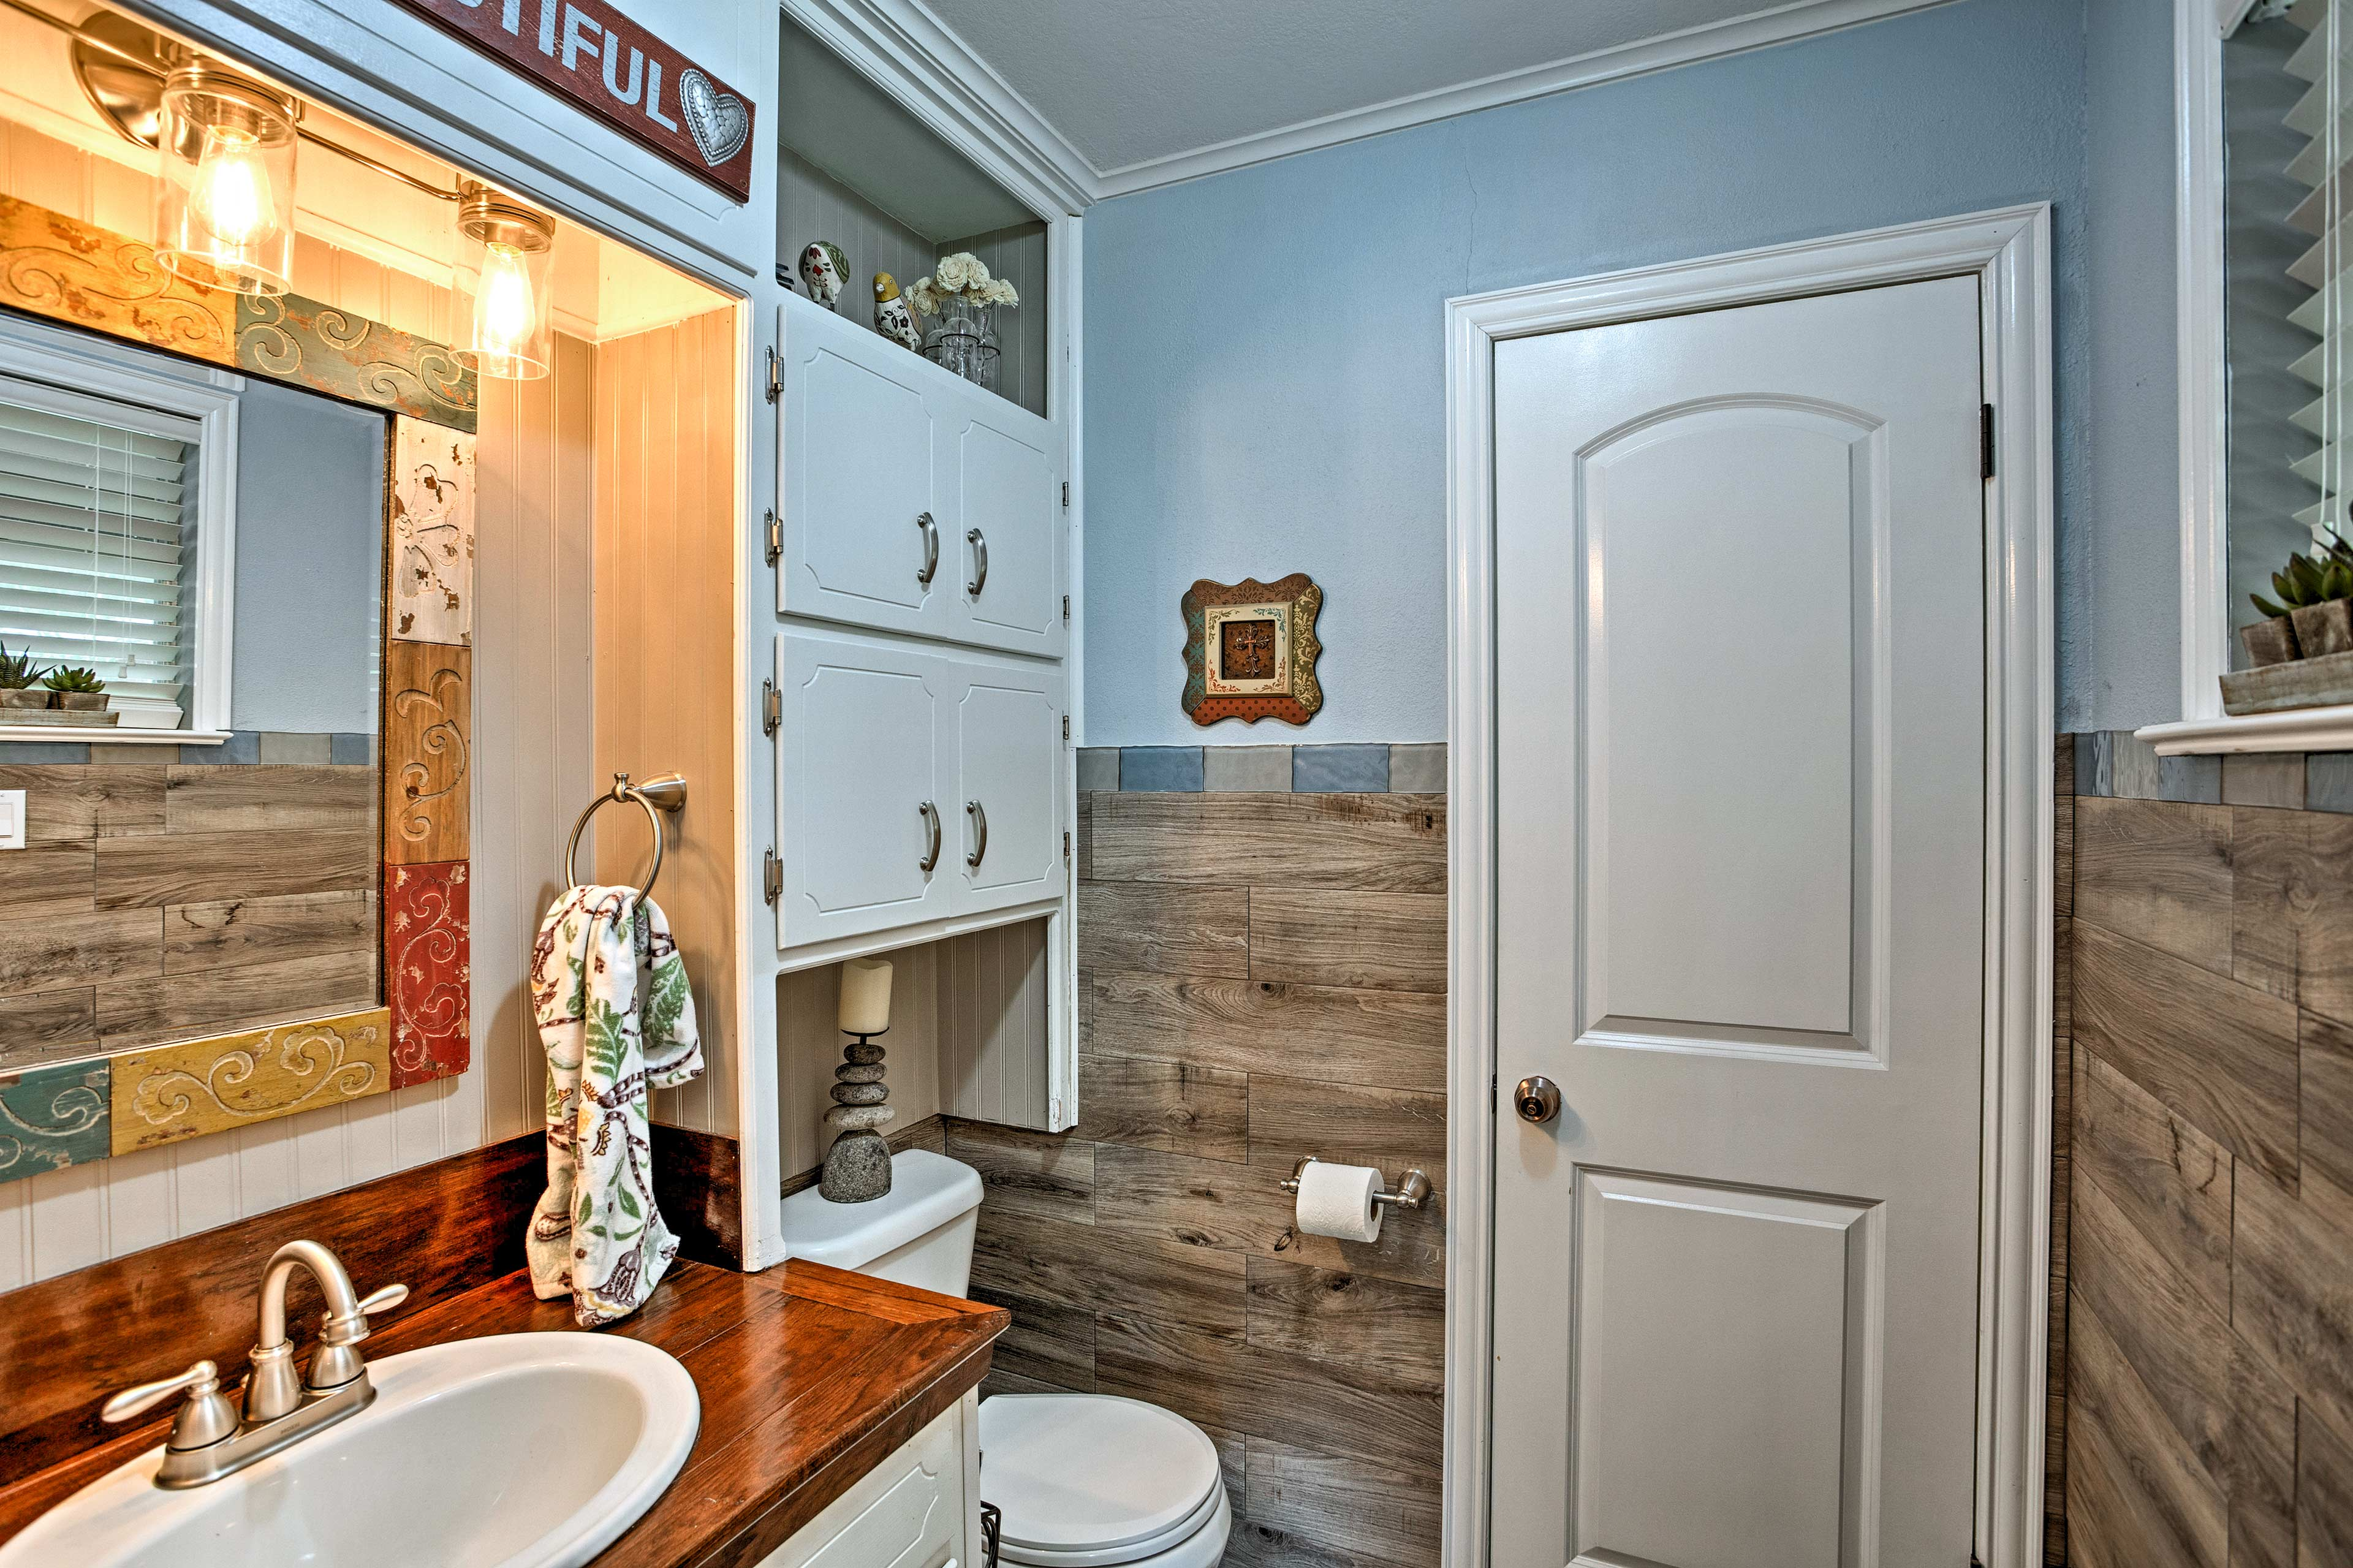 Wood paneling lines the half-bath walls.